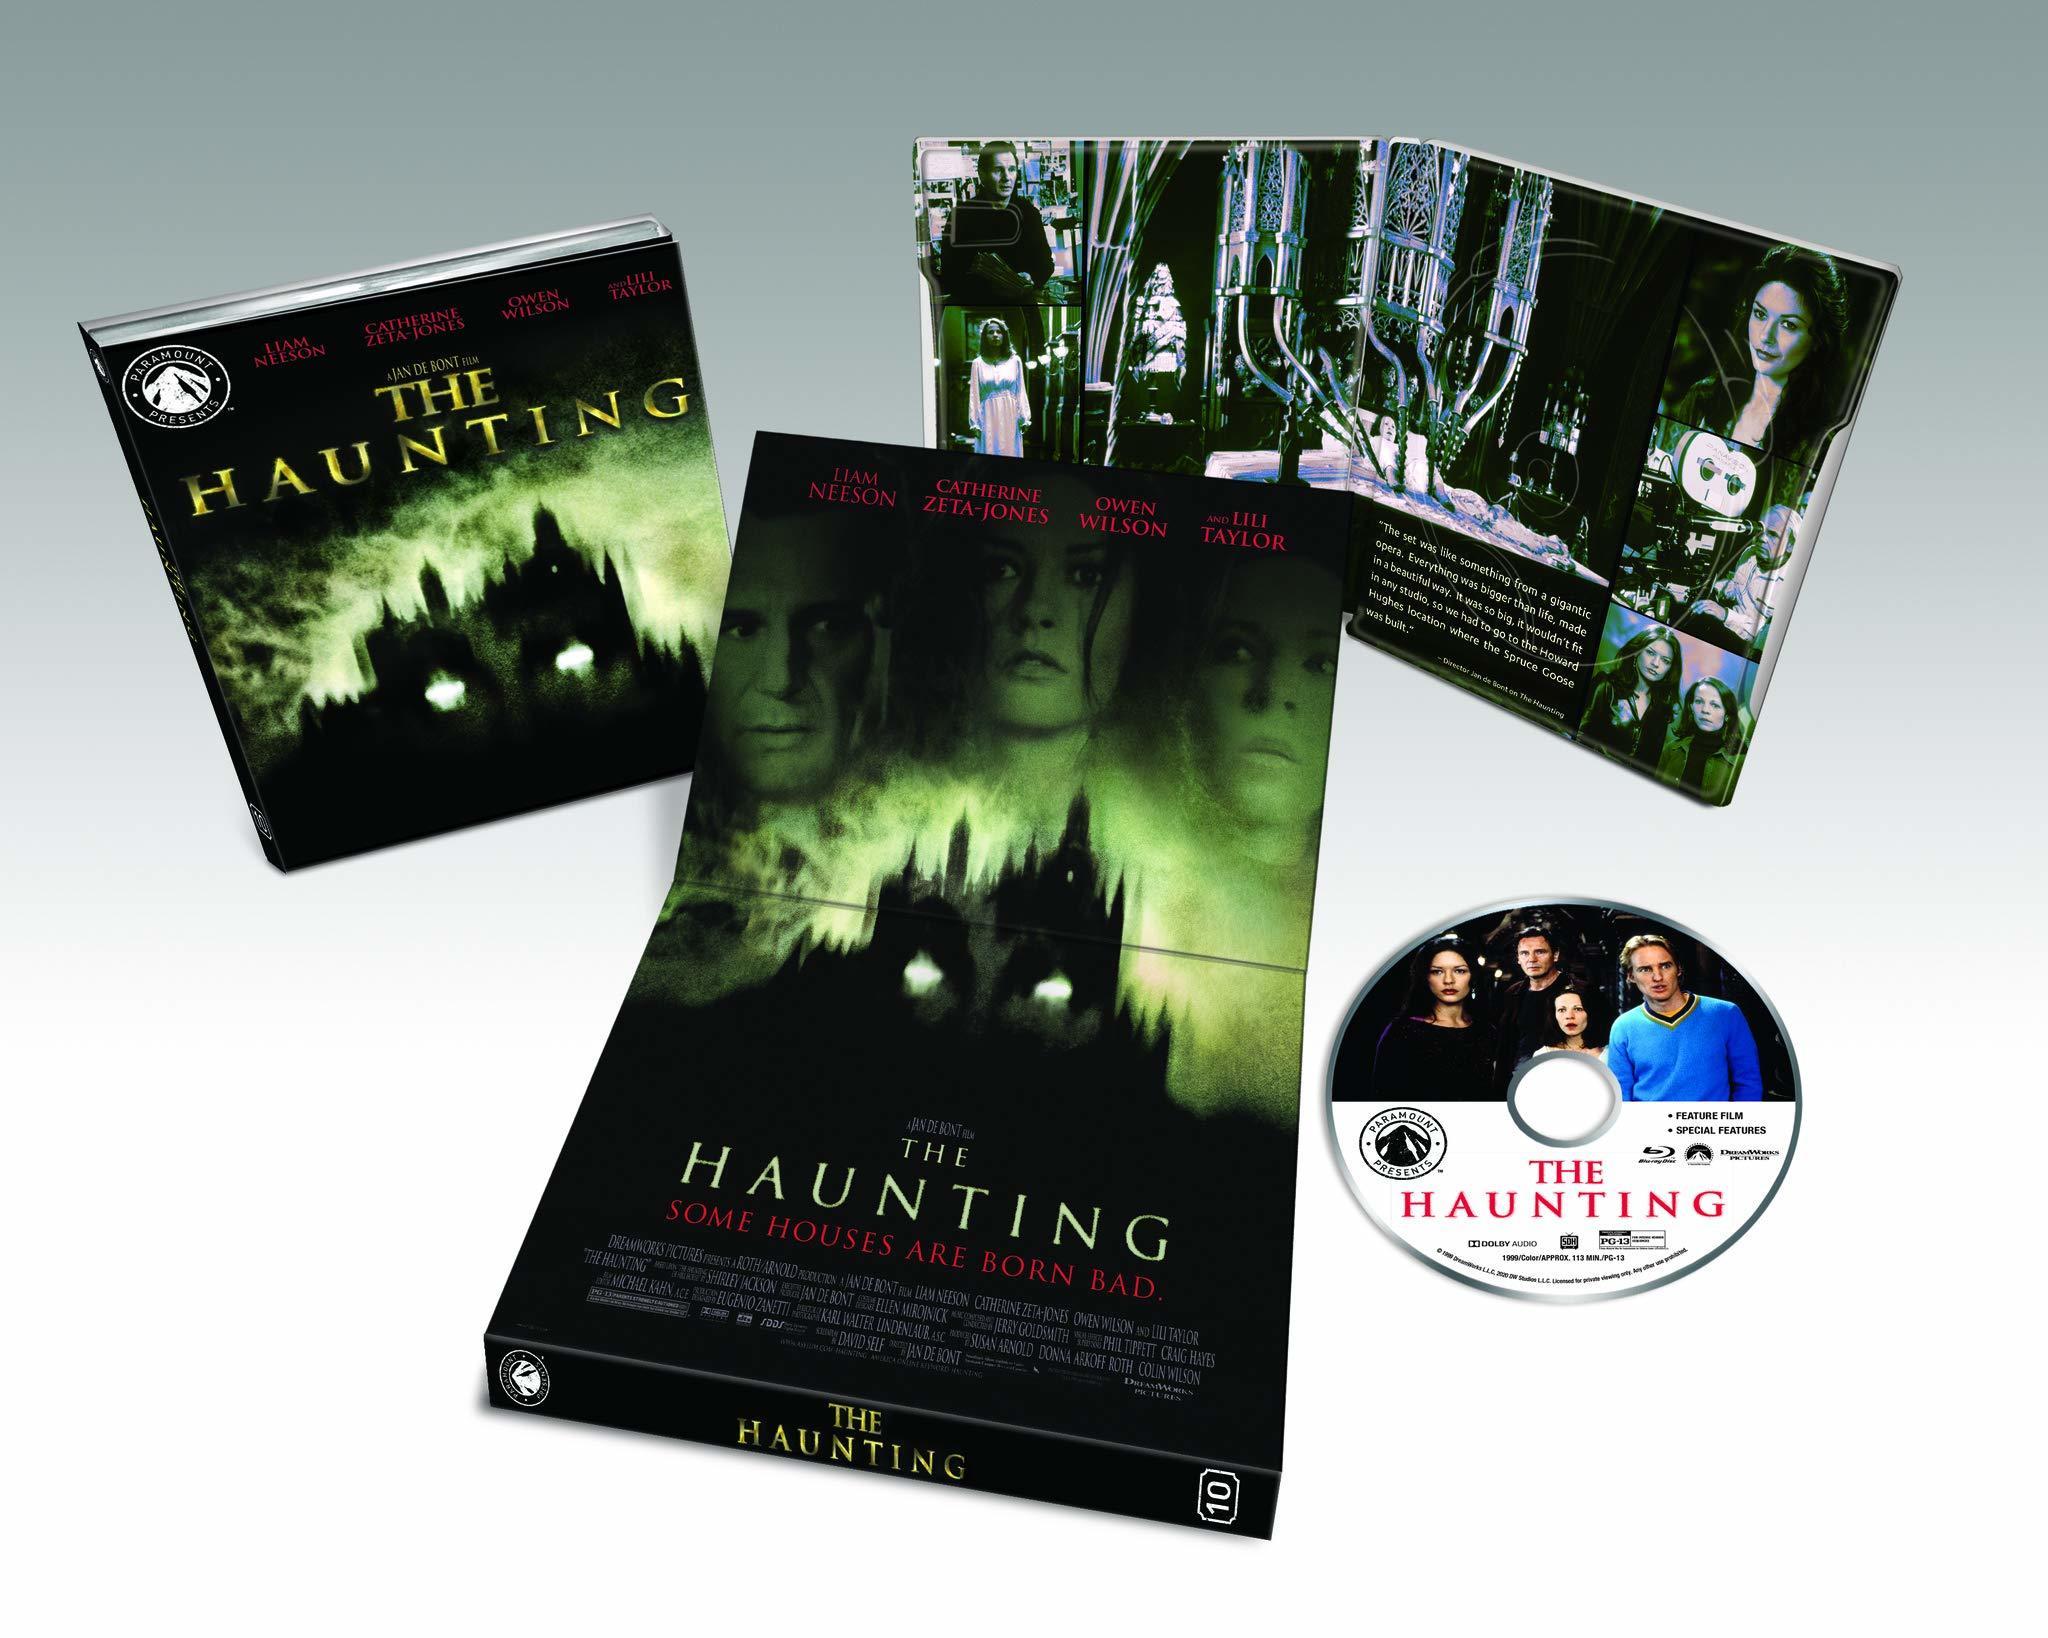 The Haunting (Blu-ray)